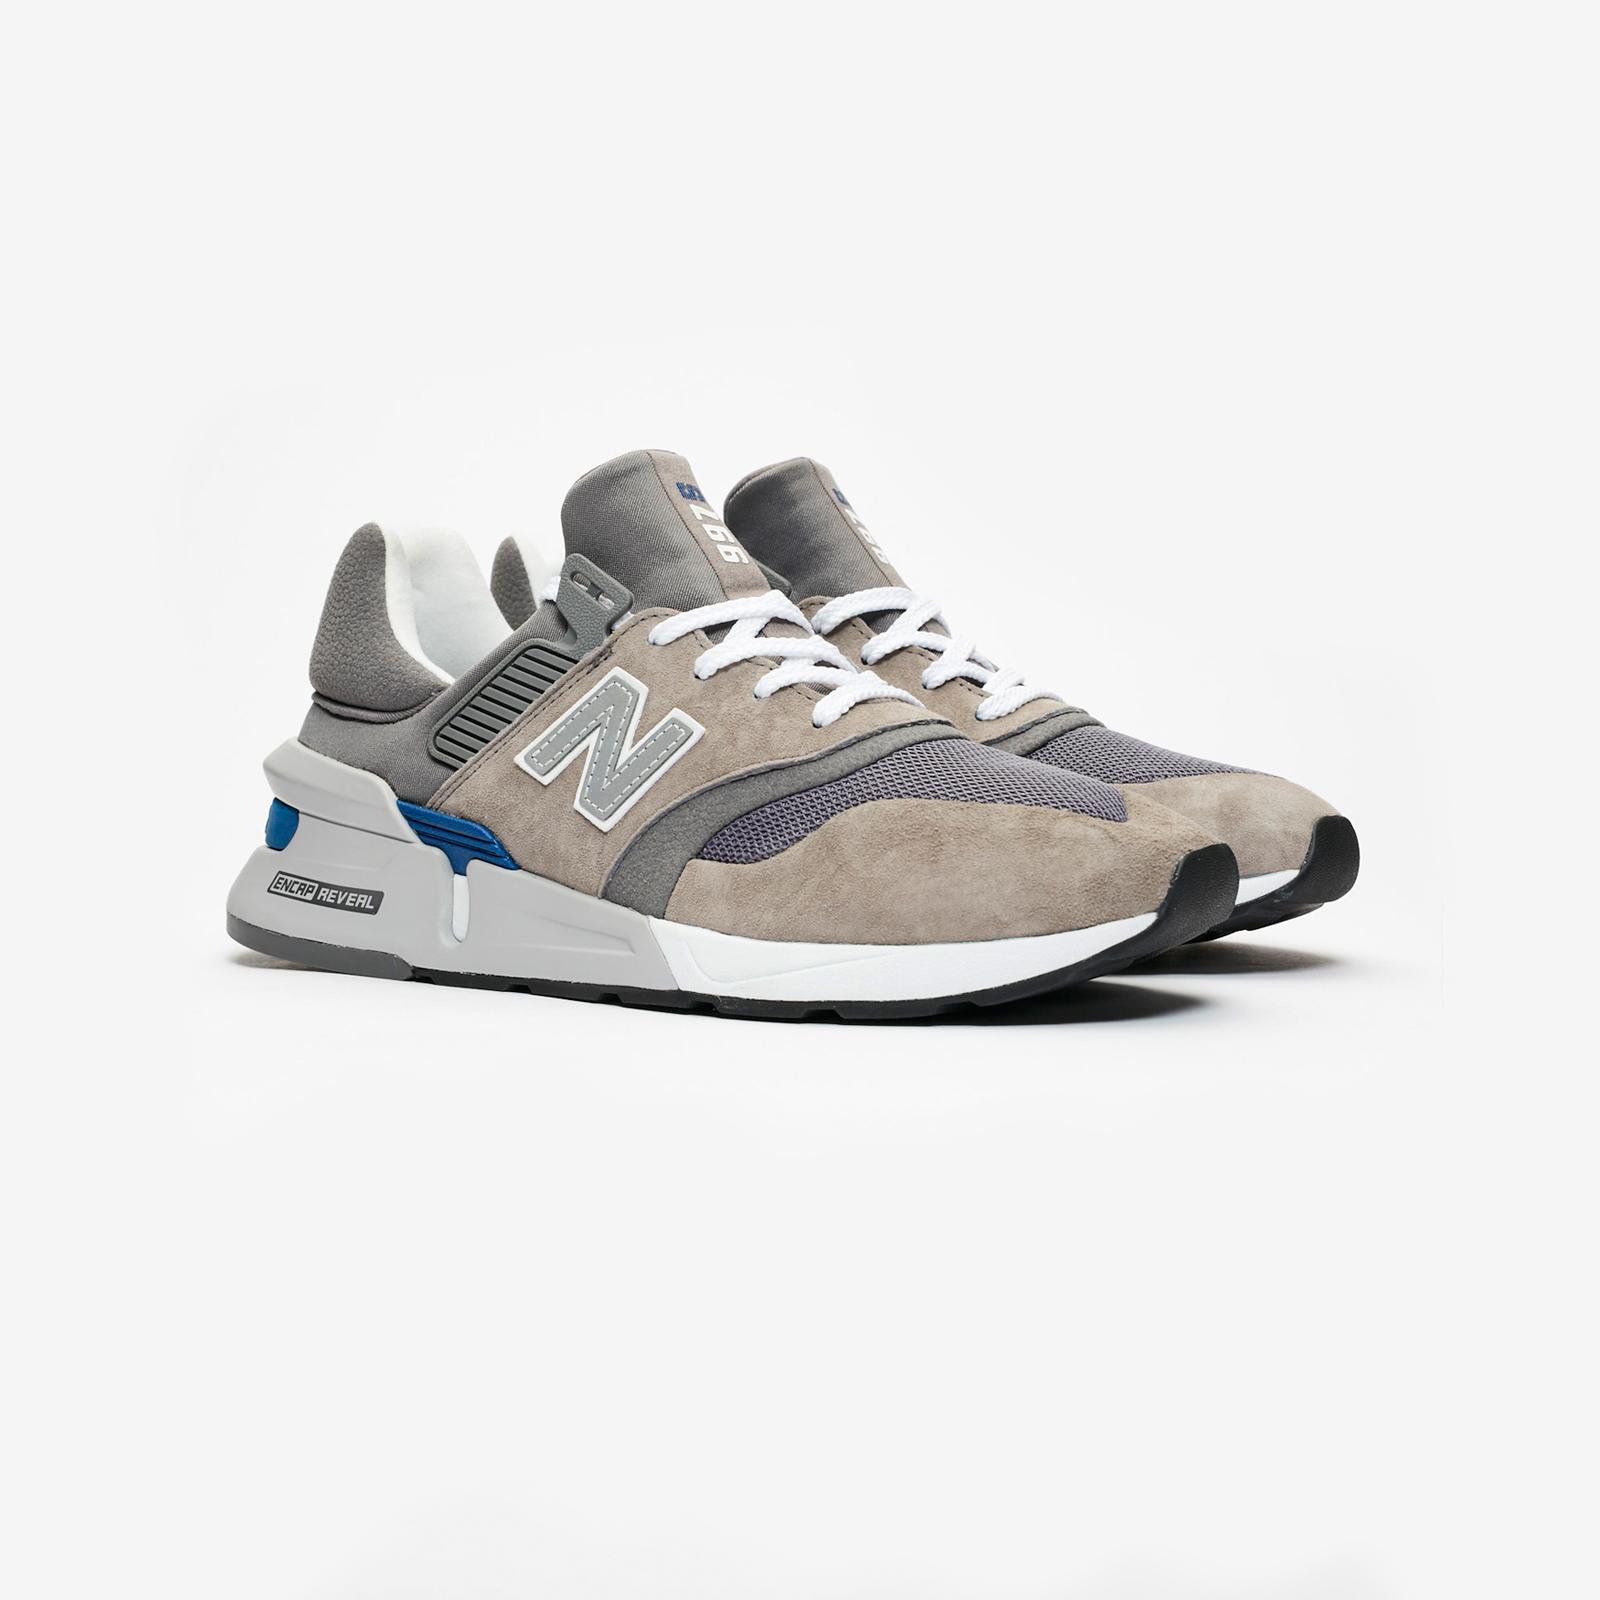 New Balance MS997 - Ms997hgc - SNS | sneakers & streetwear online ...